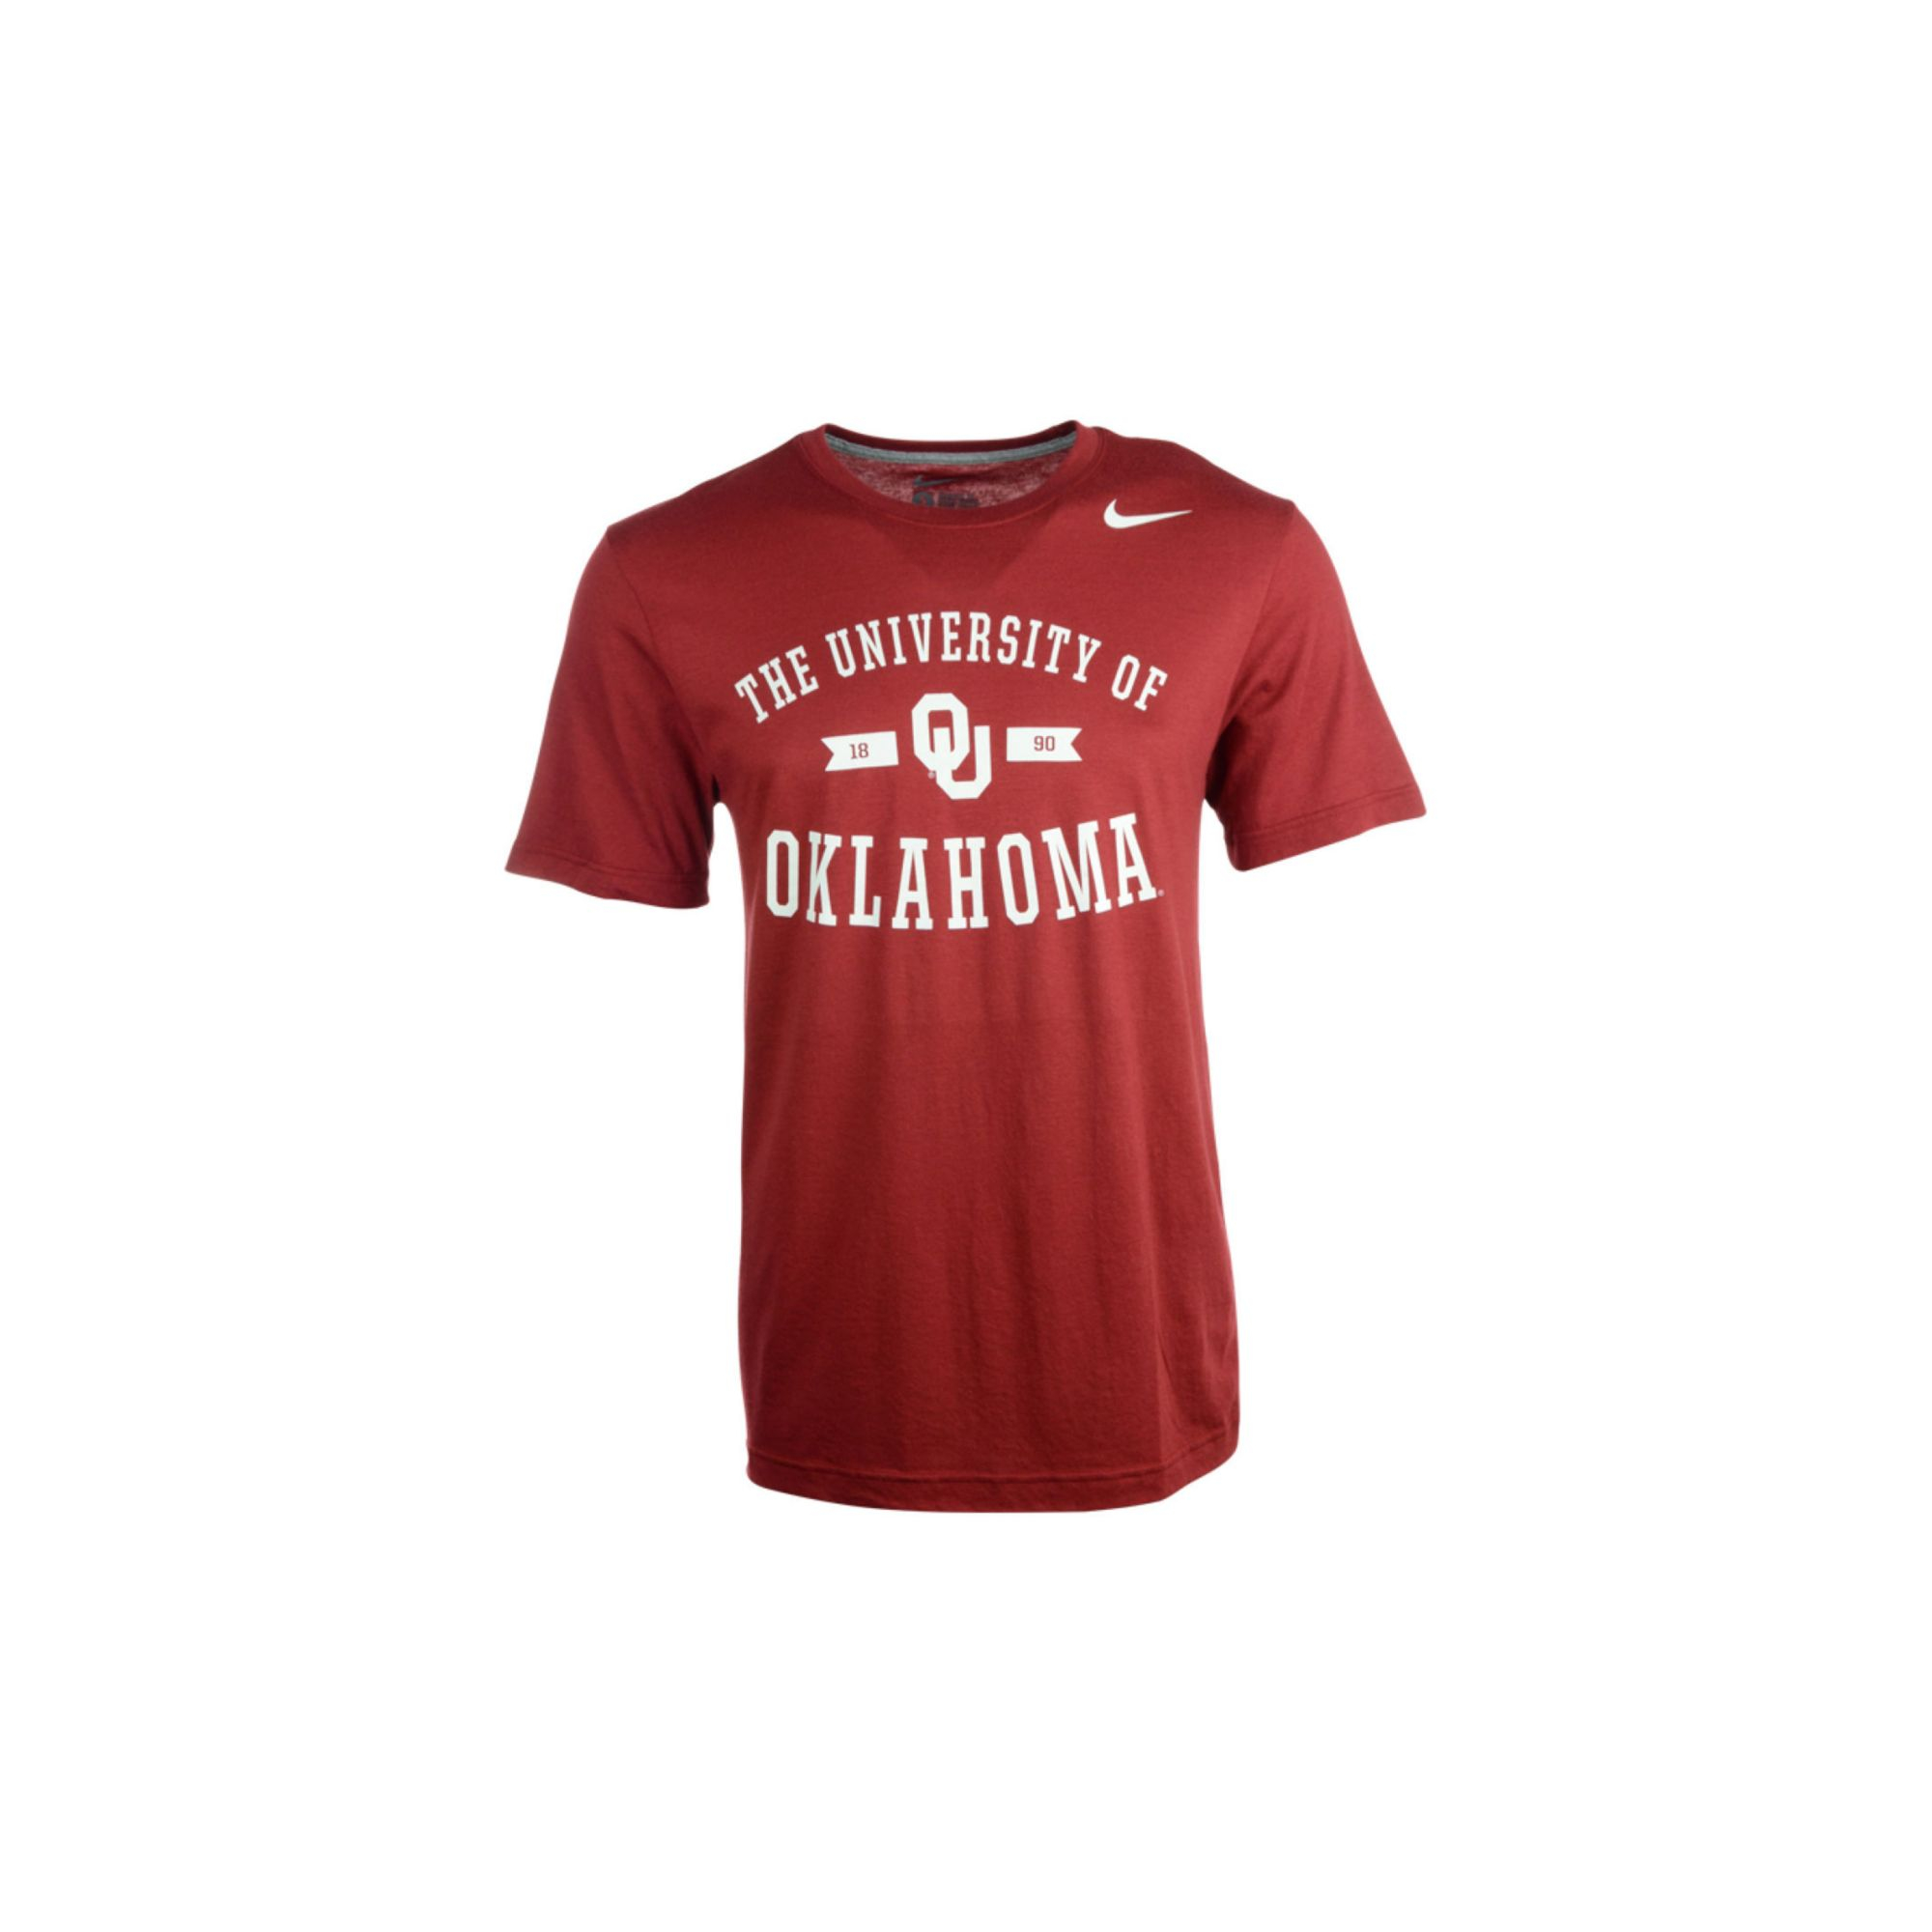 Nike Mens Shortsleeve Oklahoma Sooners Tshirt In Red For